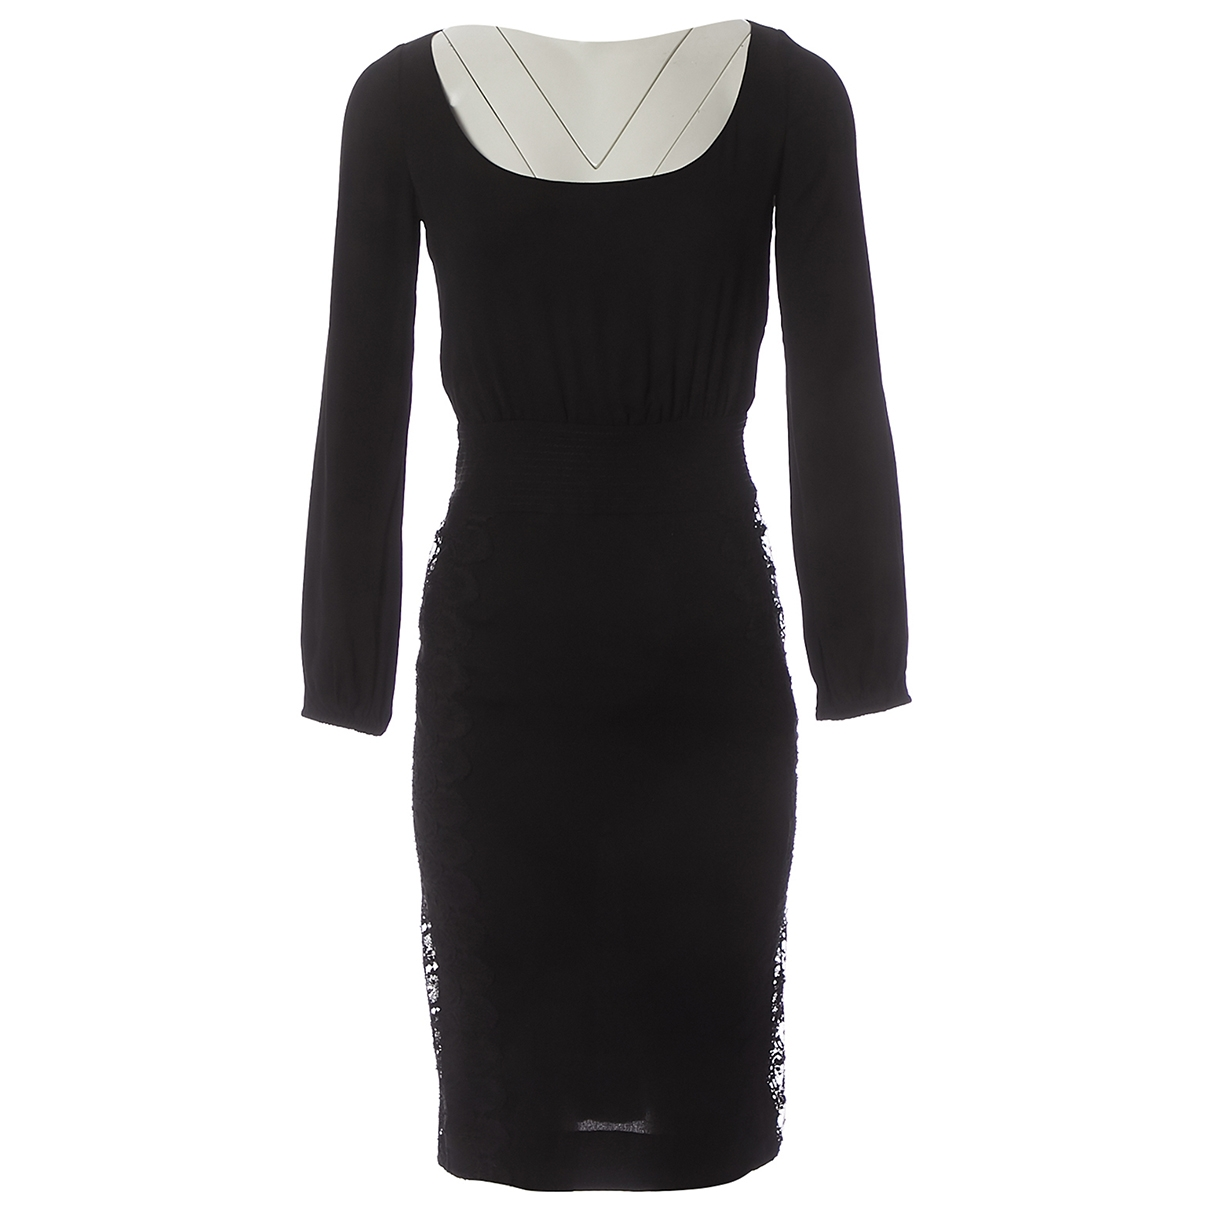 Valentino Garavani \N Black dress for Women 40 IT